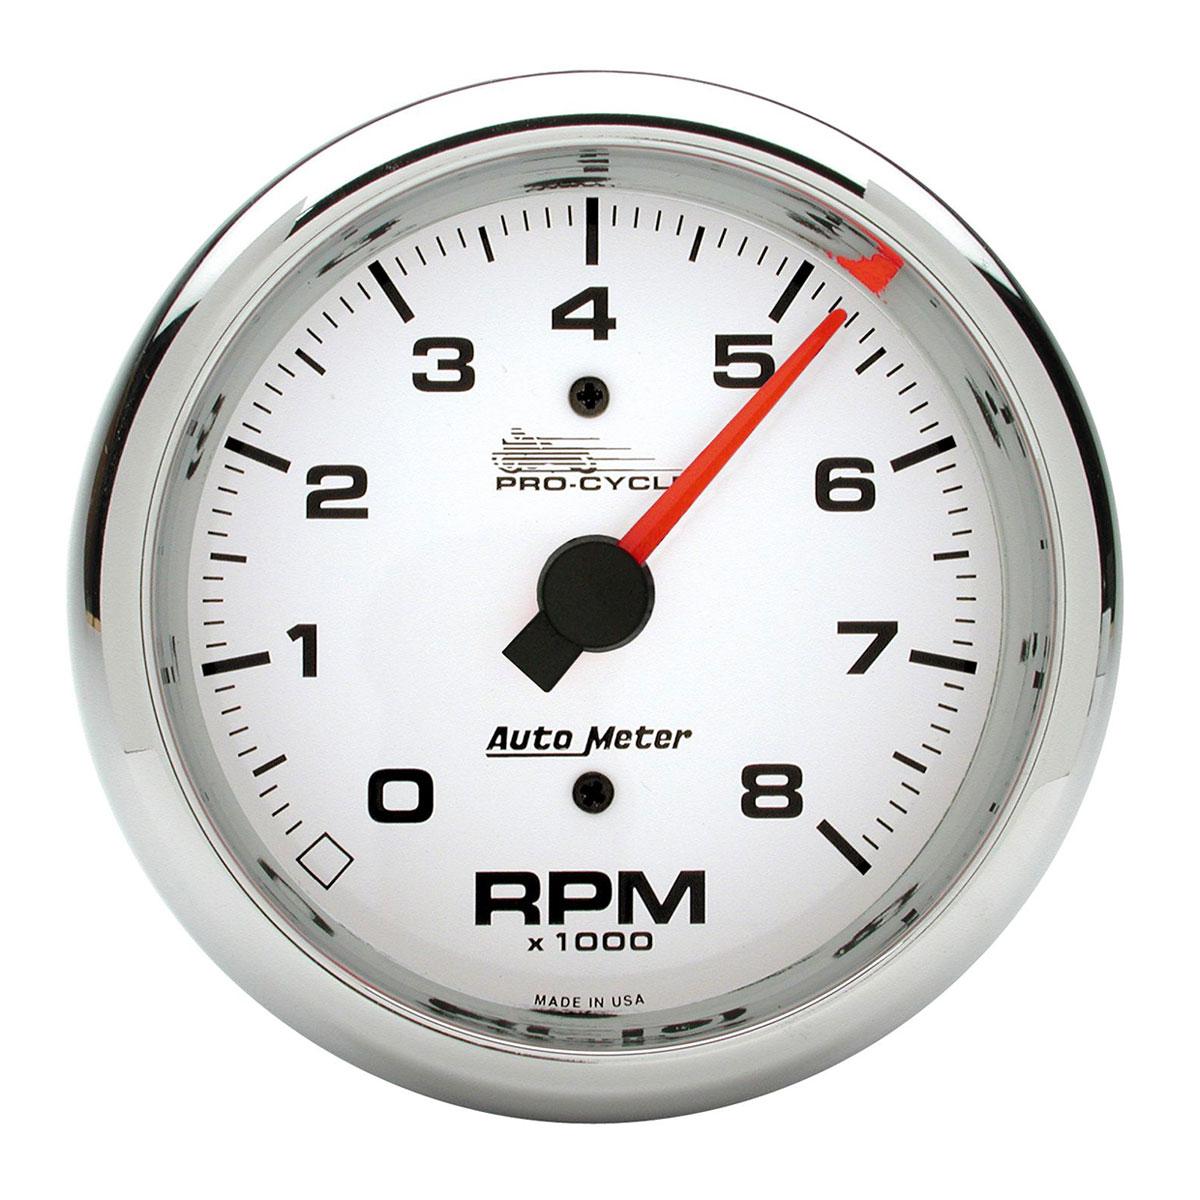 auto meter pro cycle street tachometer 19301 jpcycles comauto meter pro cycle street tachometer